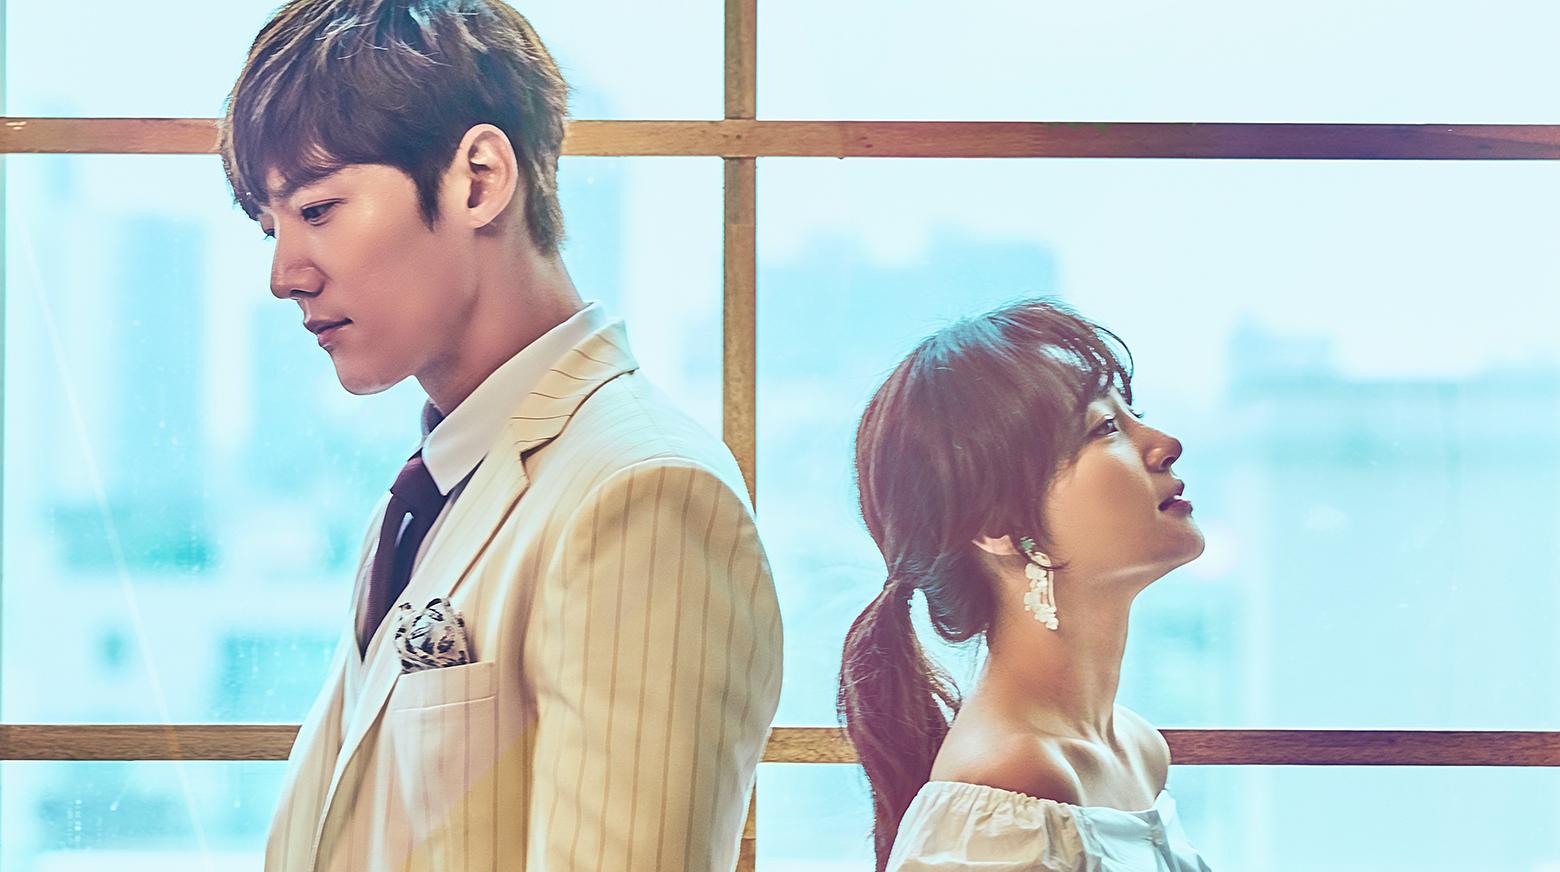 Kyung così Jin dating ebraico Senior Dating online